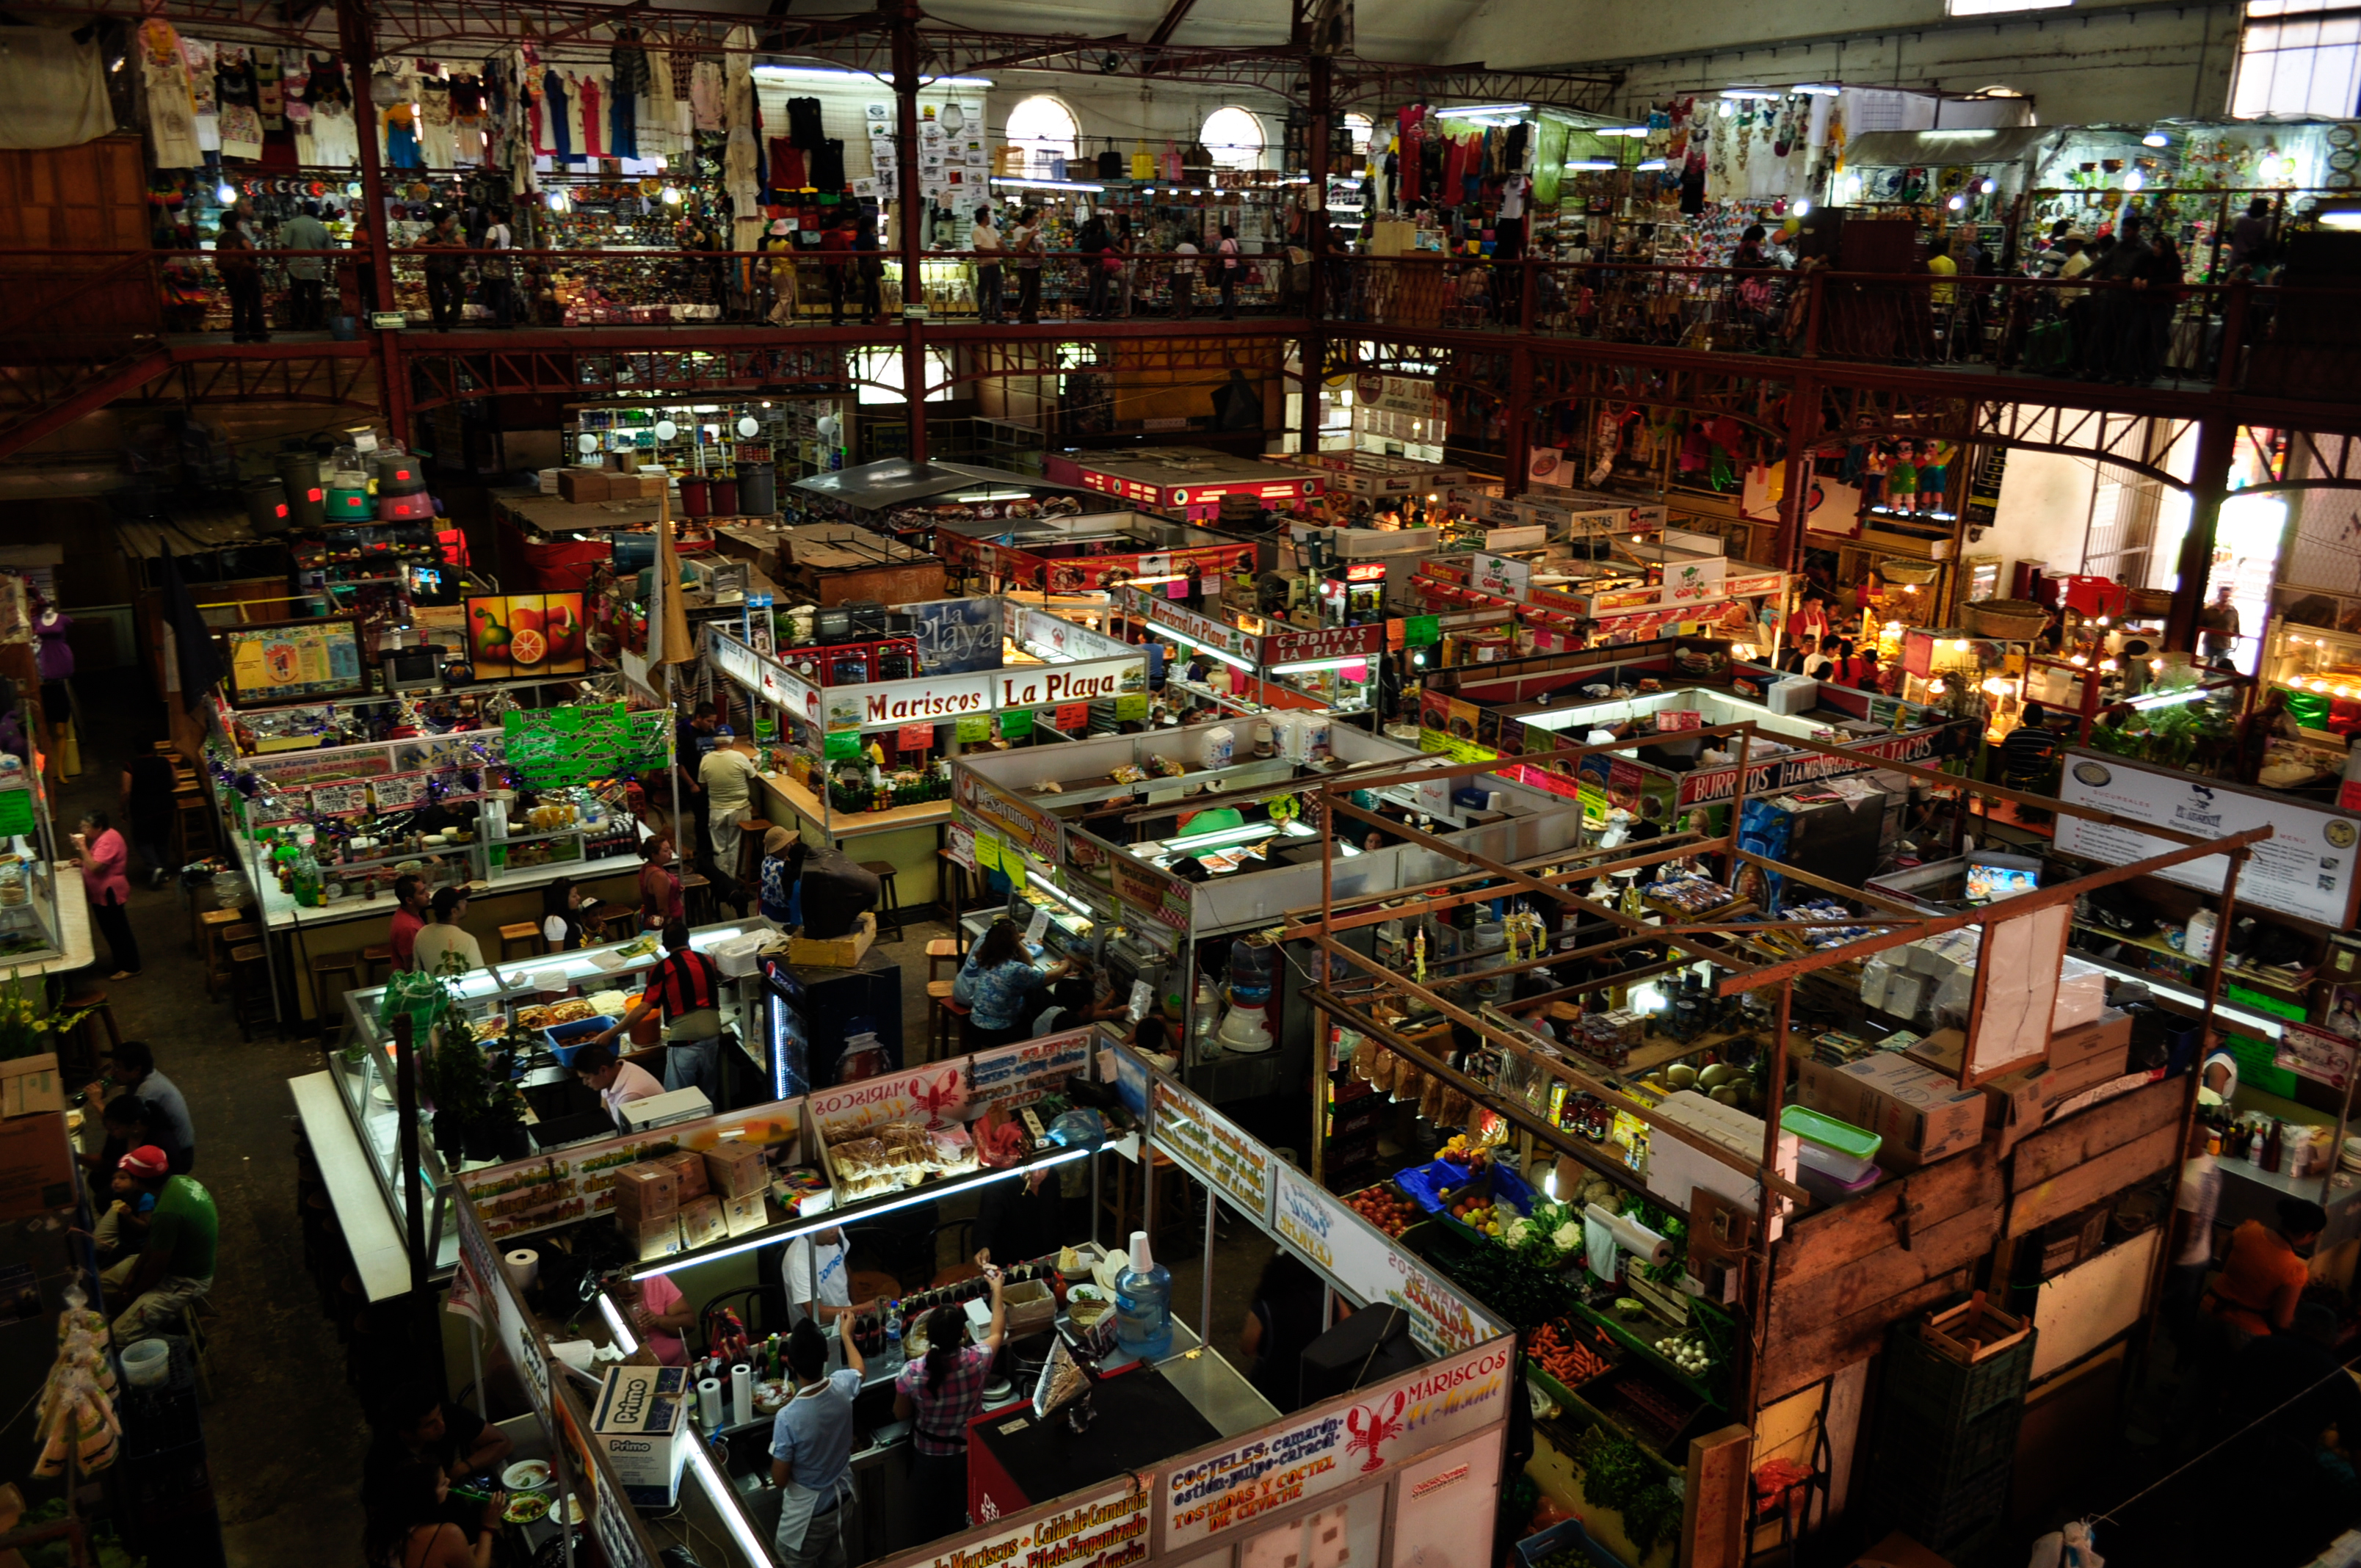 The Hidalgo Market in Guanajuato, MX